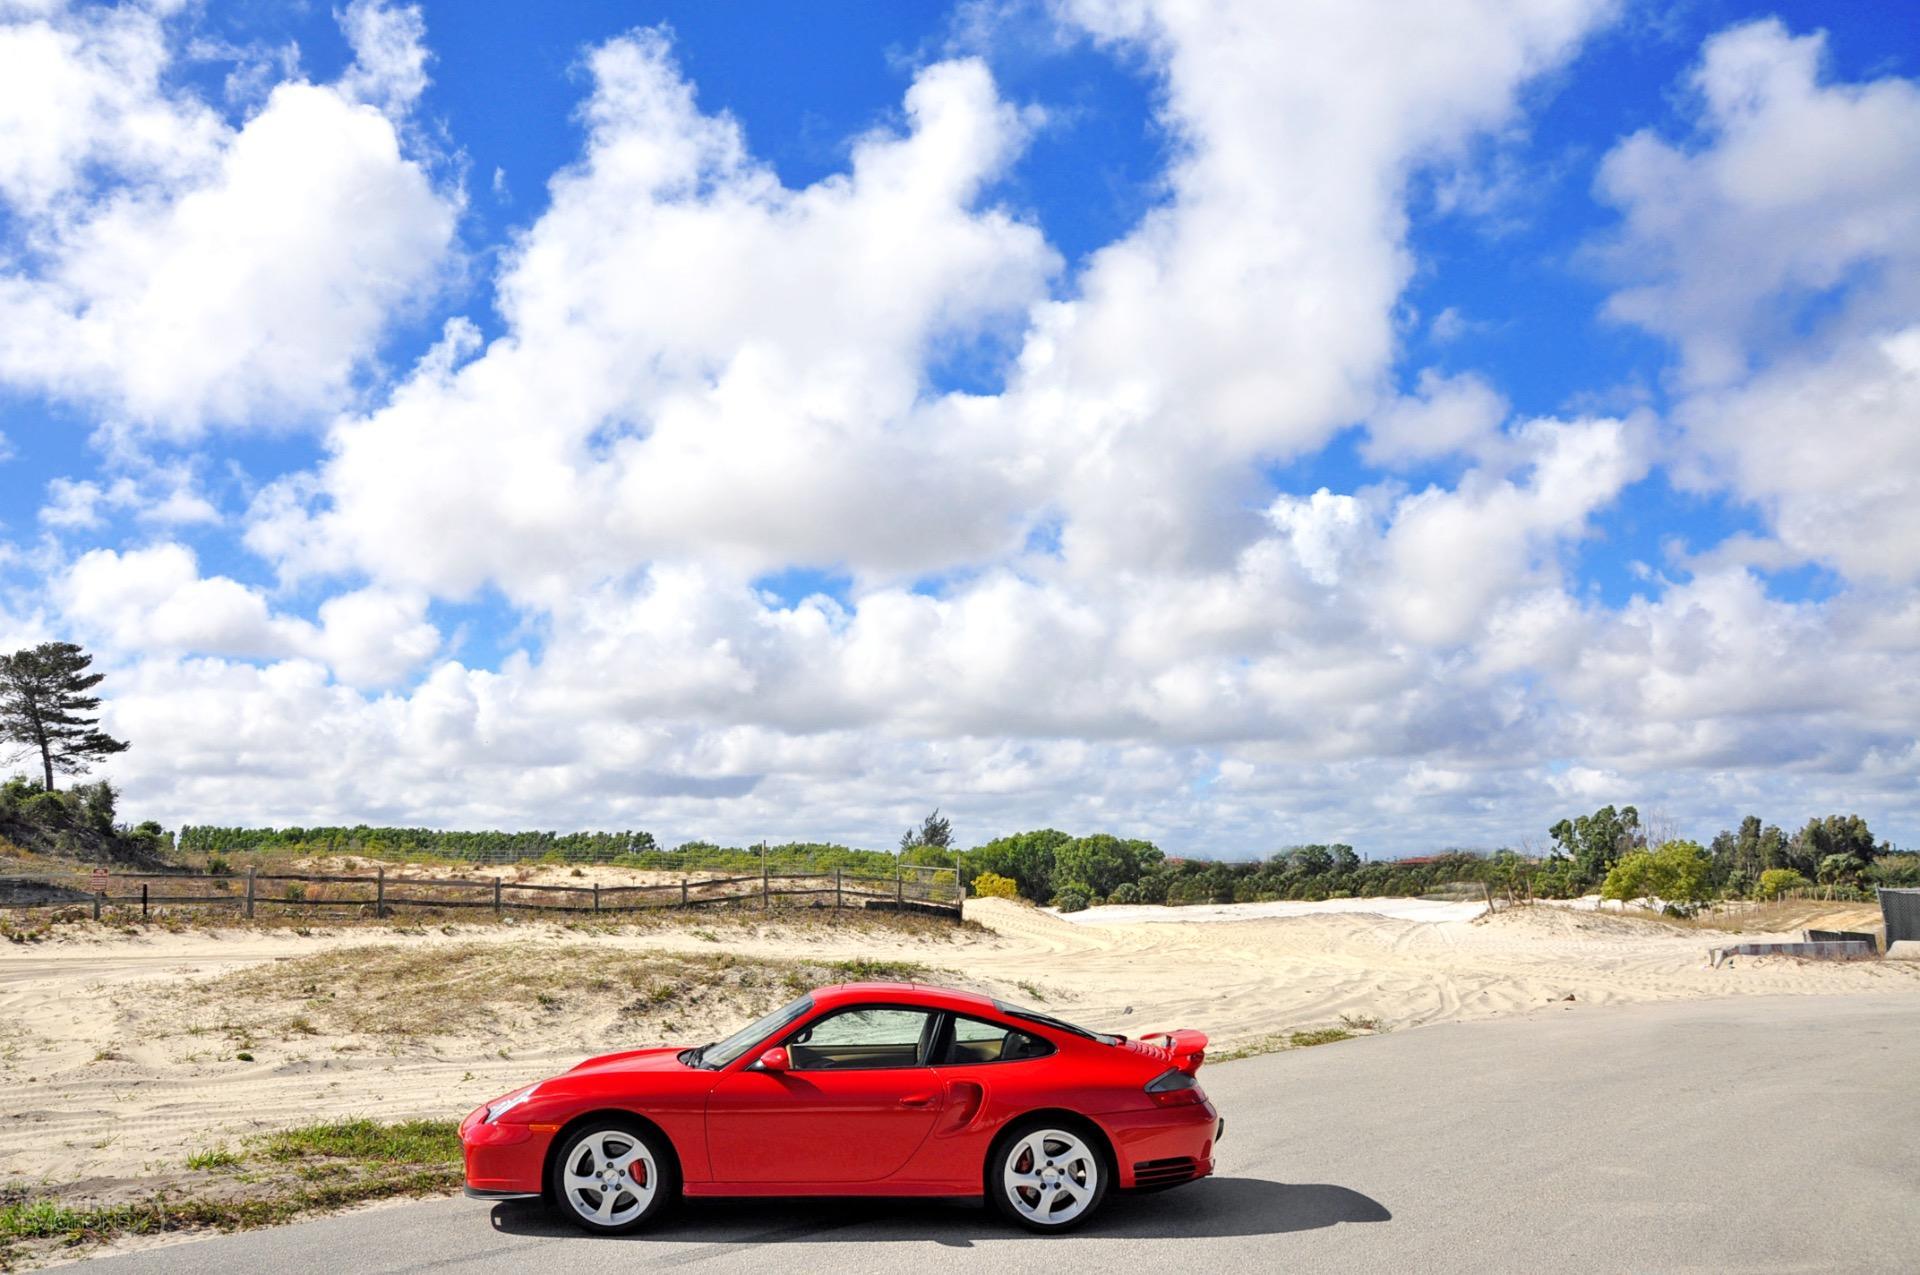 Used 2002 Porsche 911 Turbo Turbo | Lake Park, FL